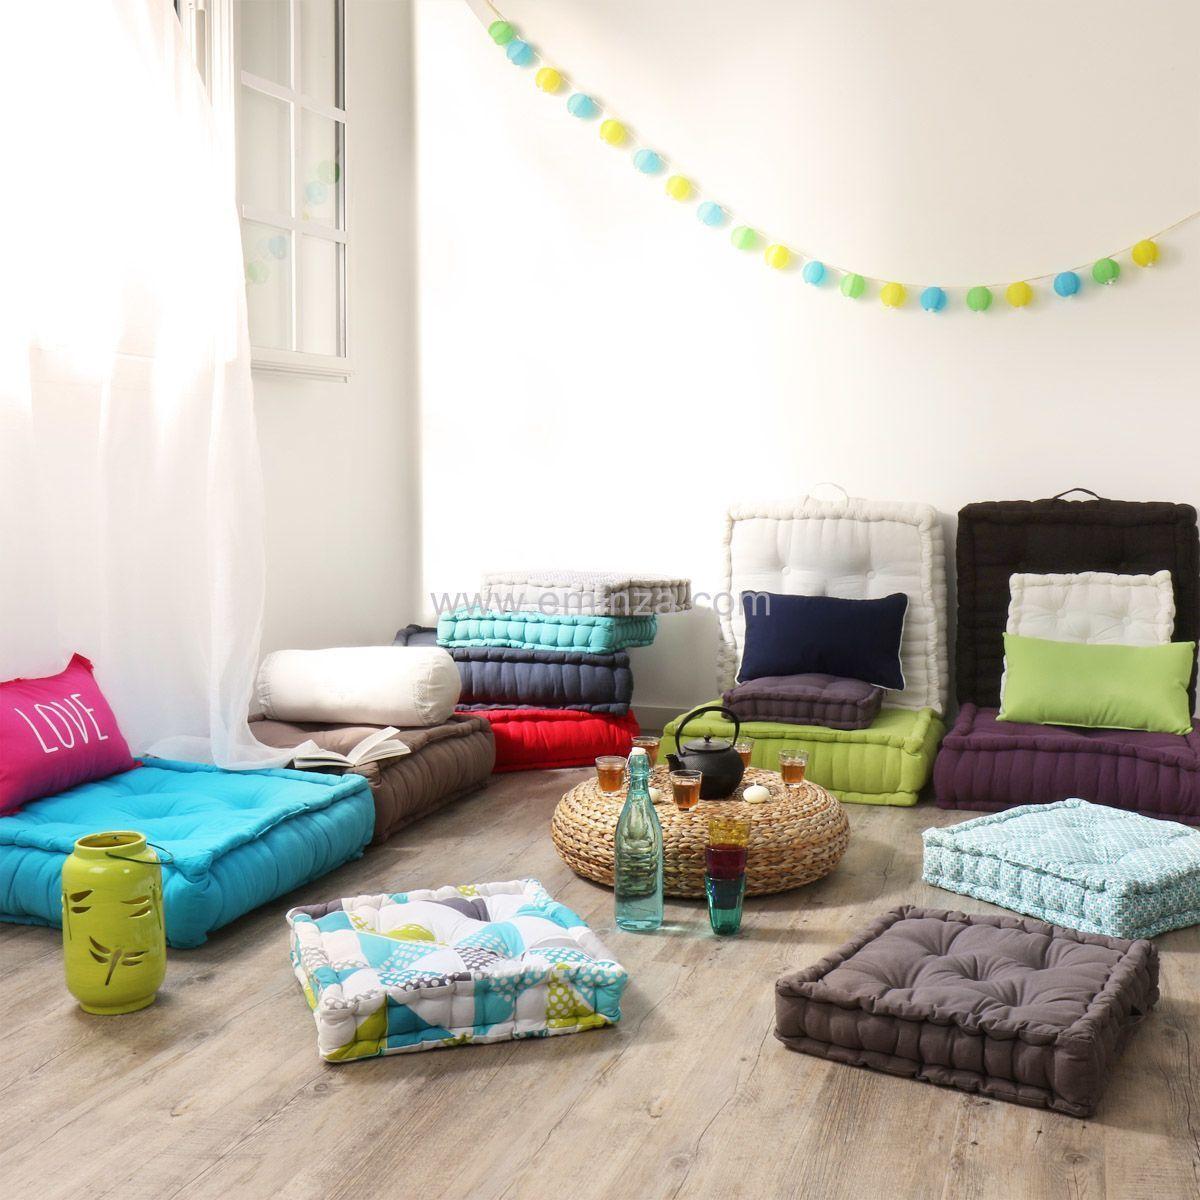 grand coussin de sol 60 cm etna vison coussin de sol. Black Bedroom Furniture Sets. Home Design Ideas